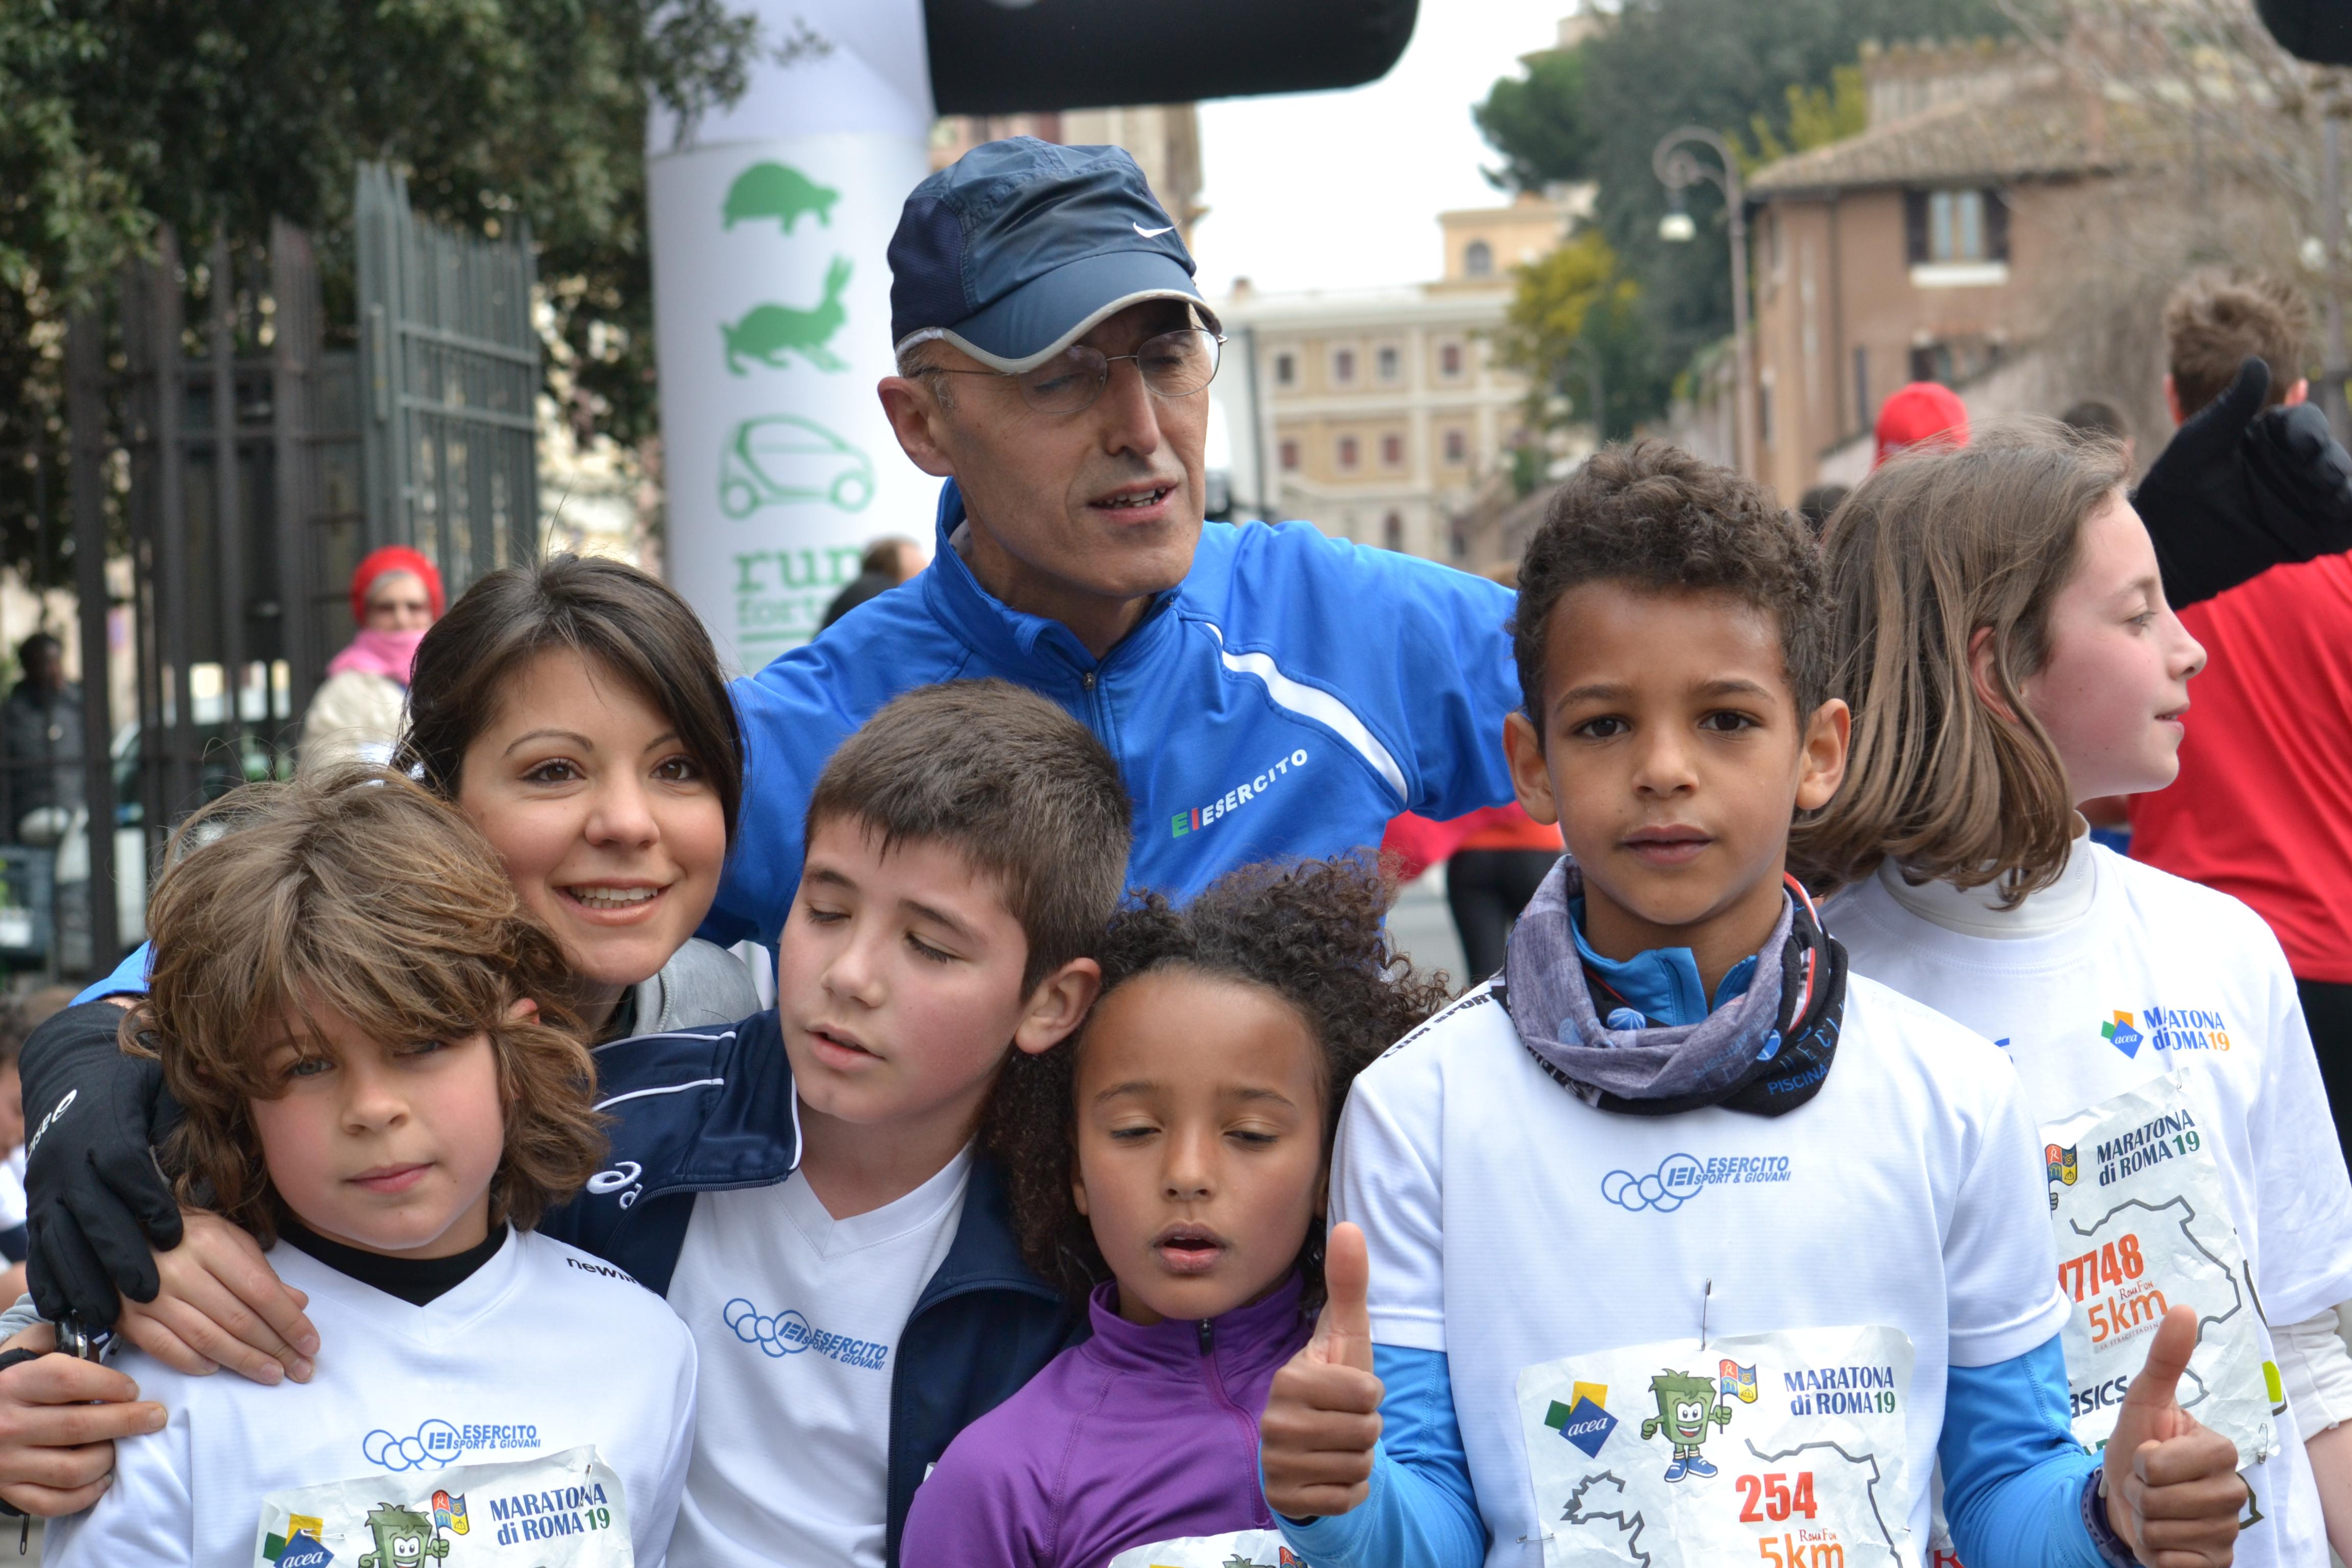 maratona-di-roma-2013-474